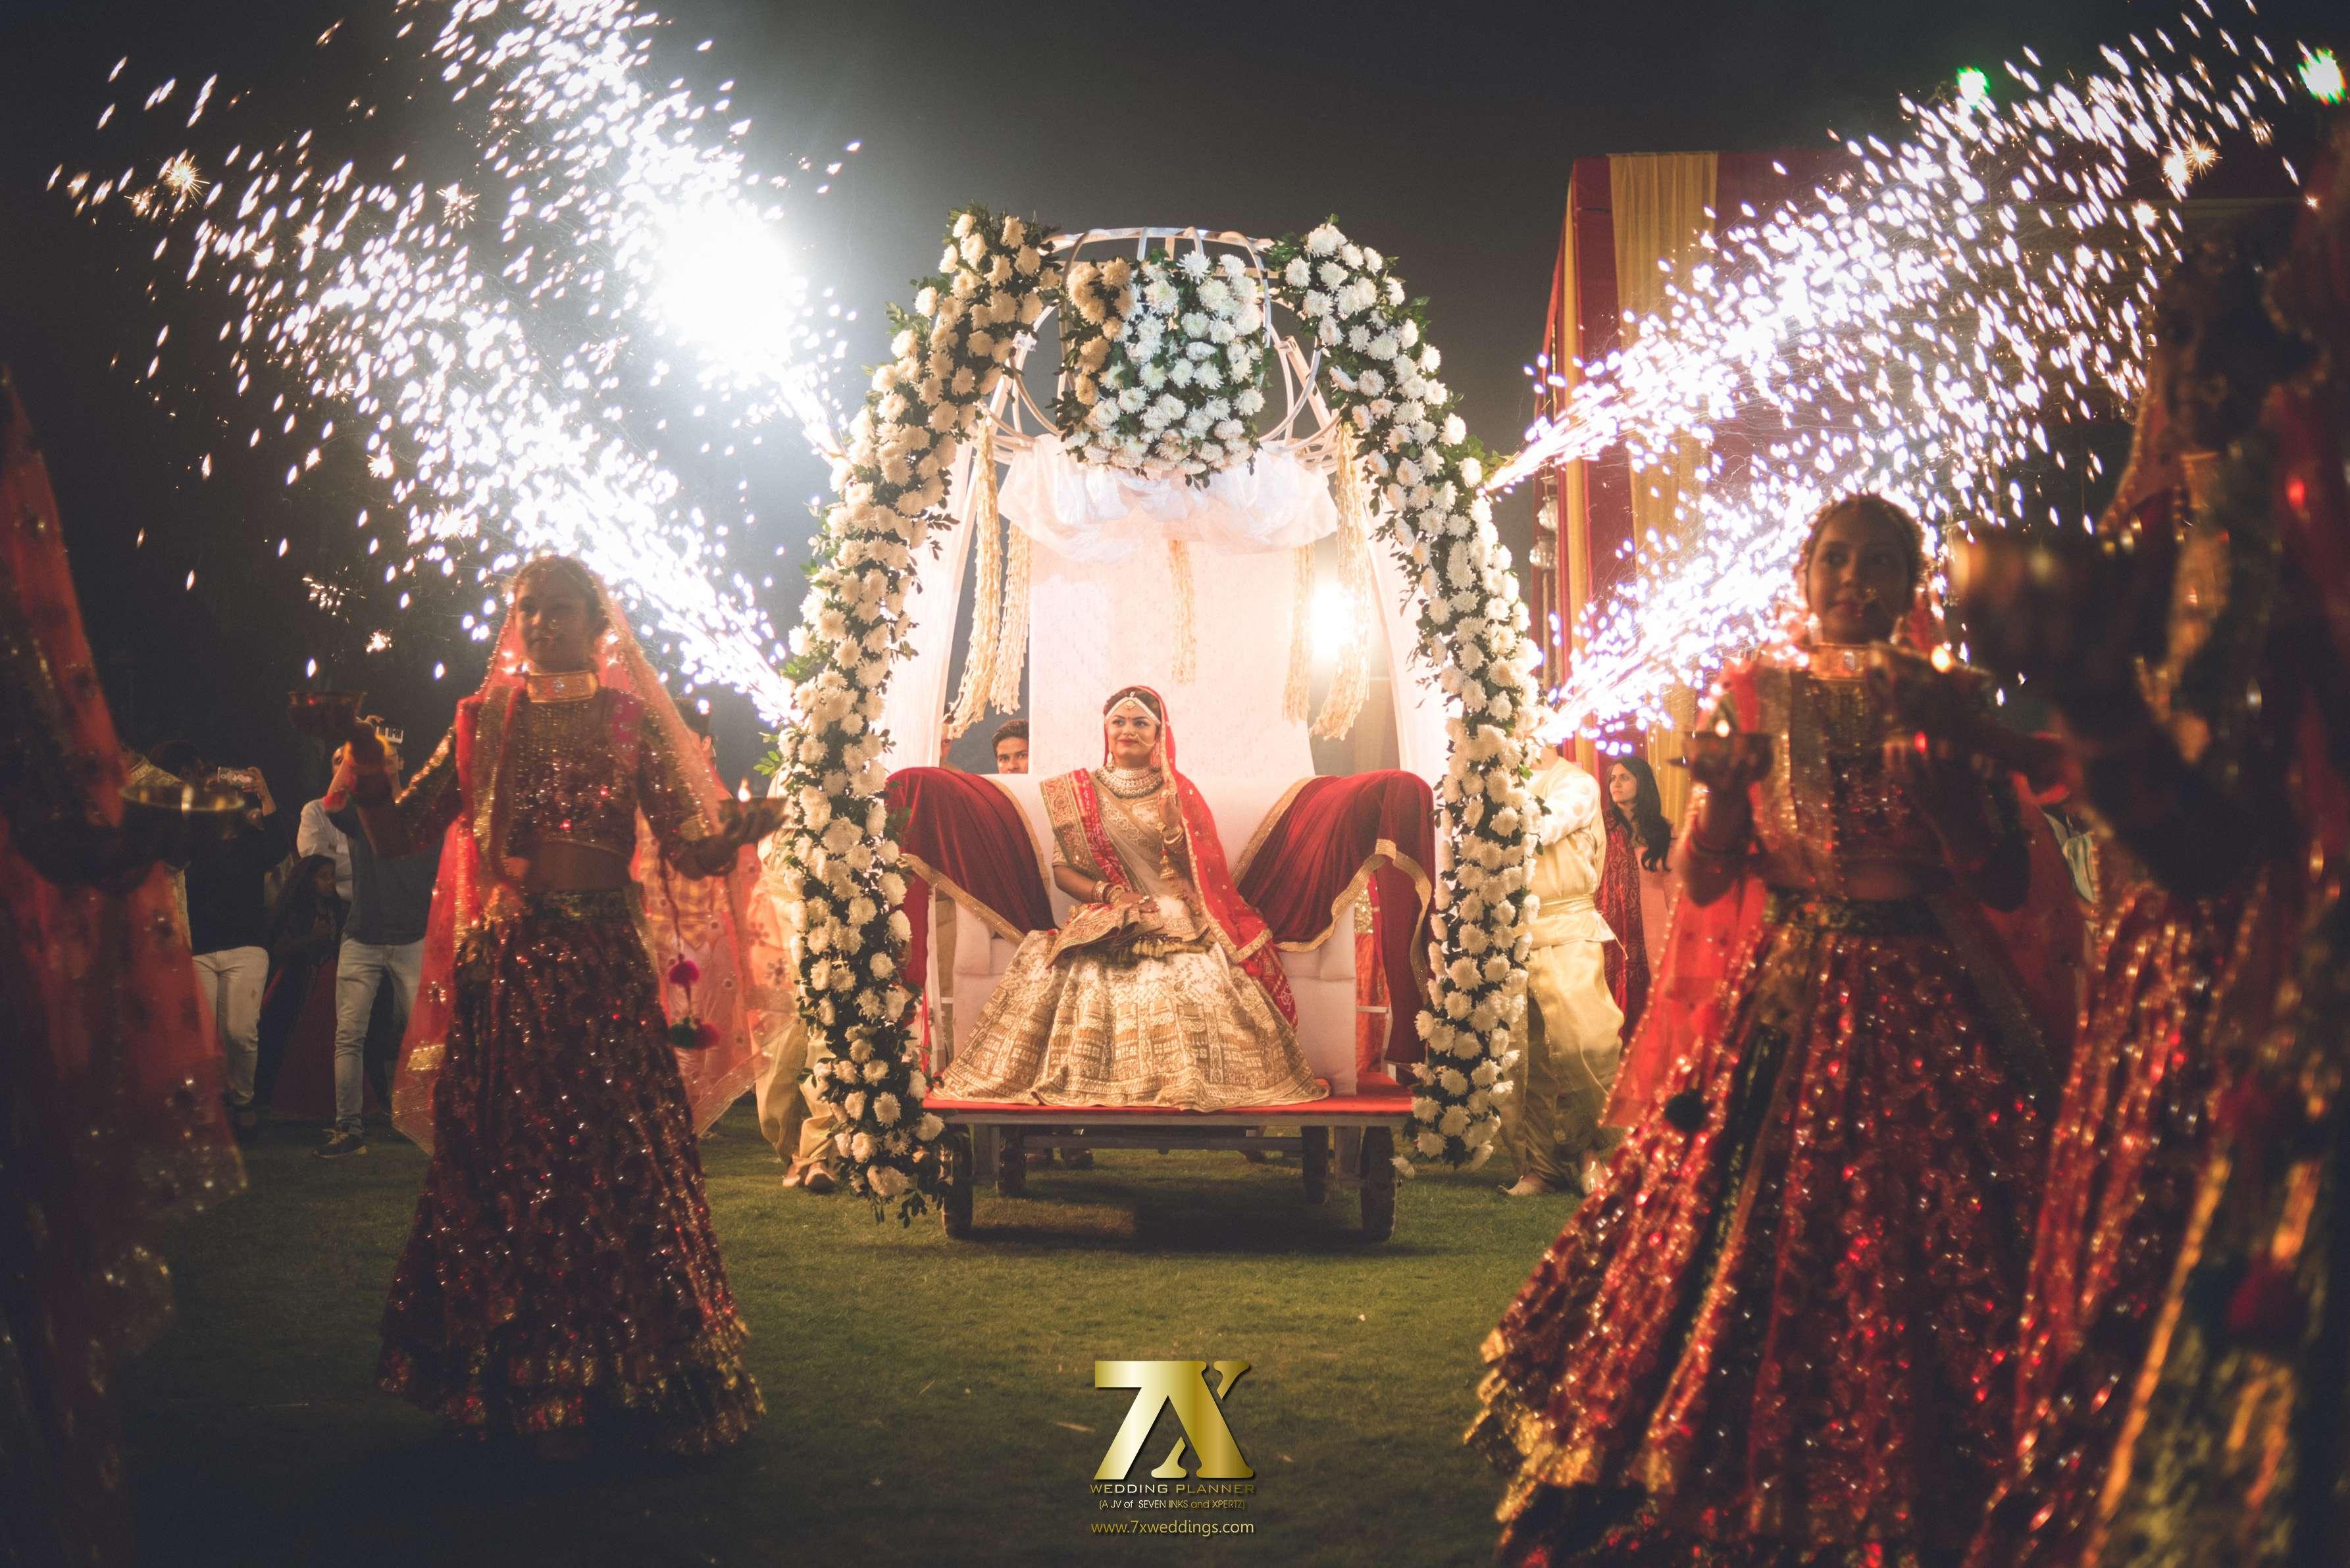 7X Wedding By Dev-Raj - Portfolio